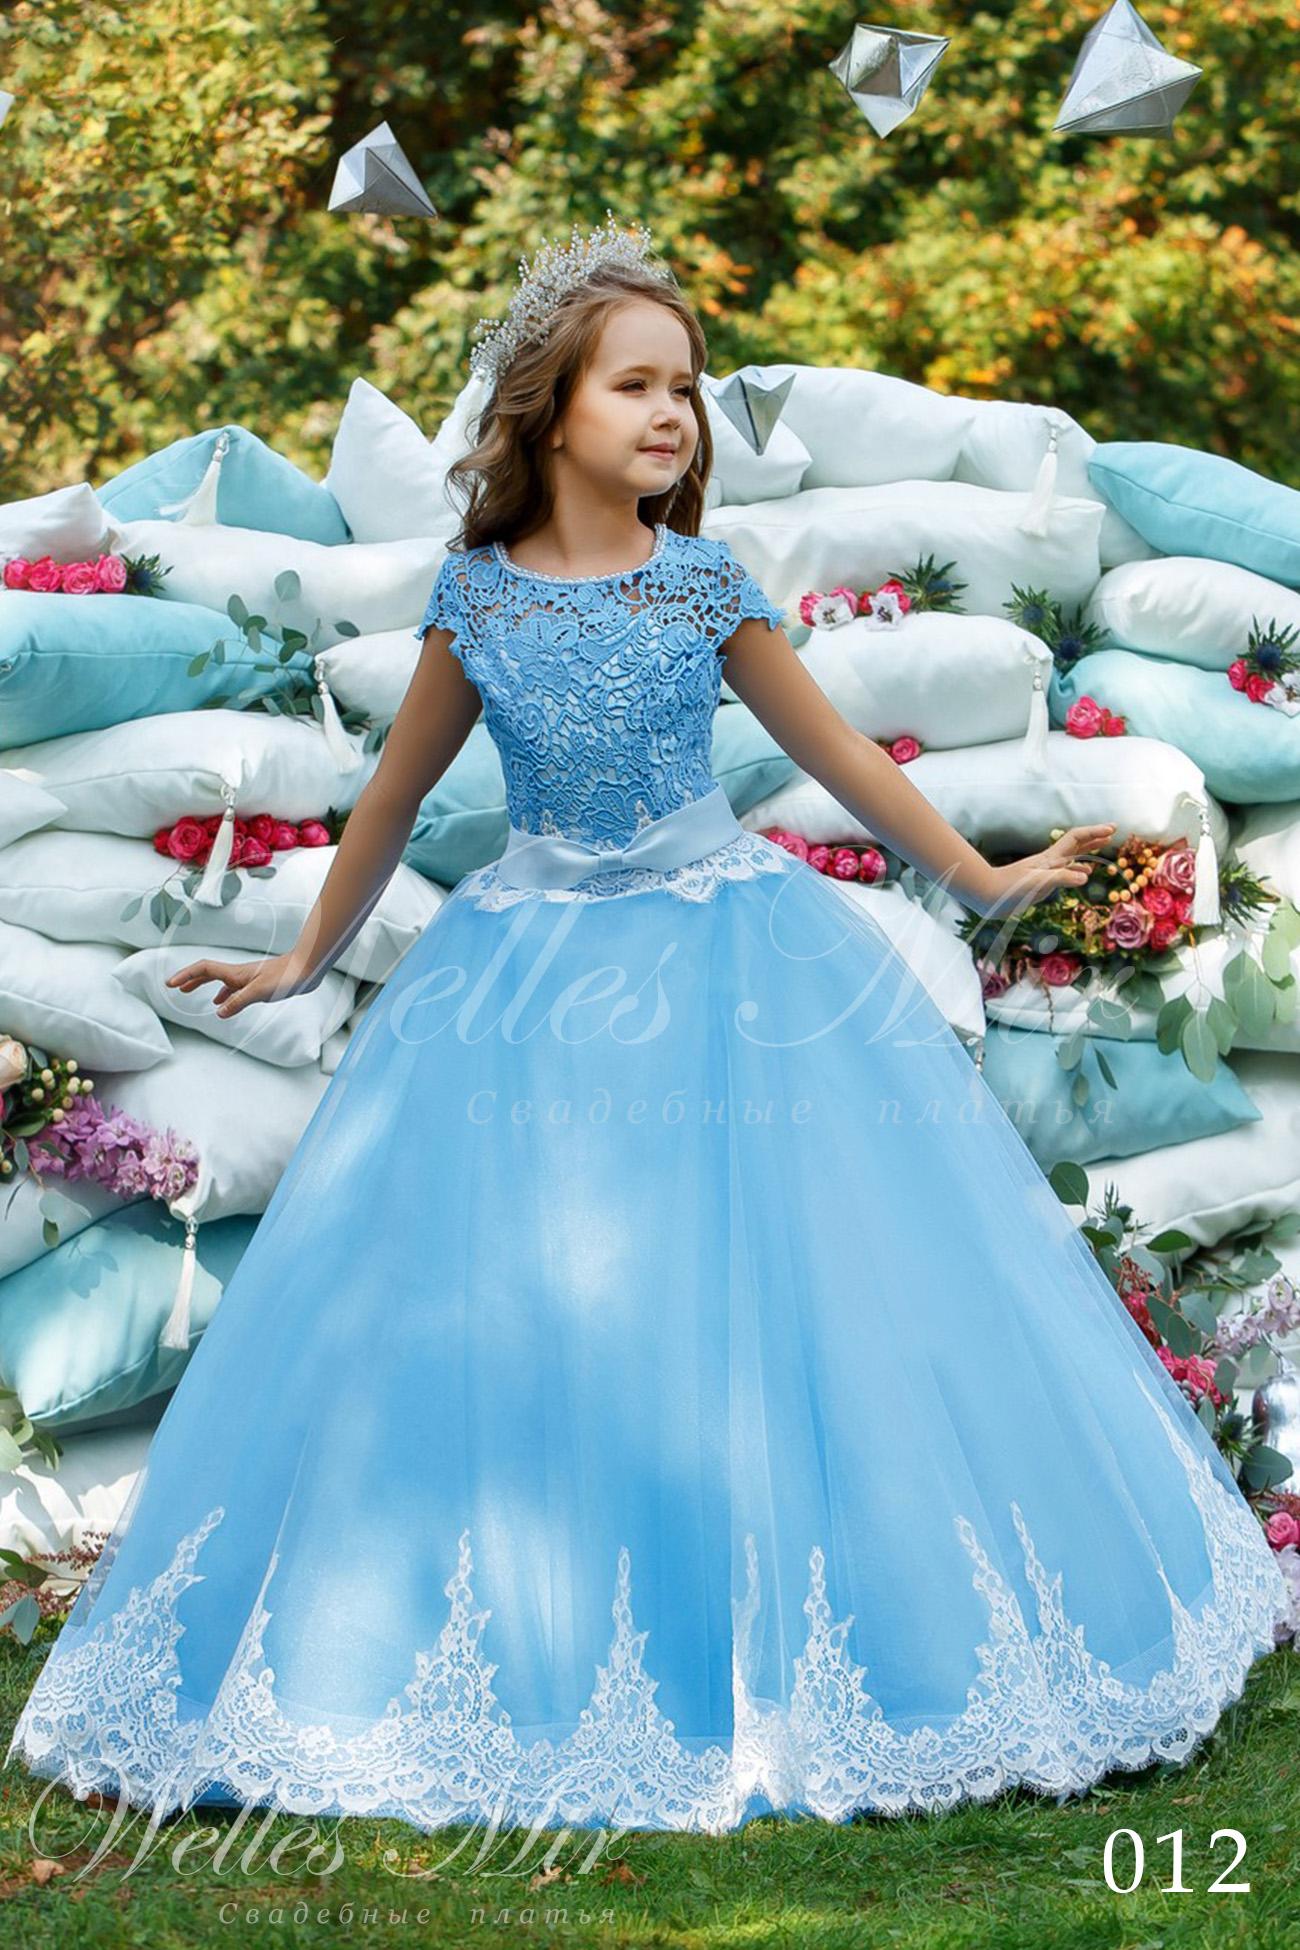 Дитячі сукні Kids Deluxe Collection 2018 - 012